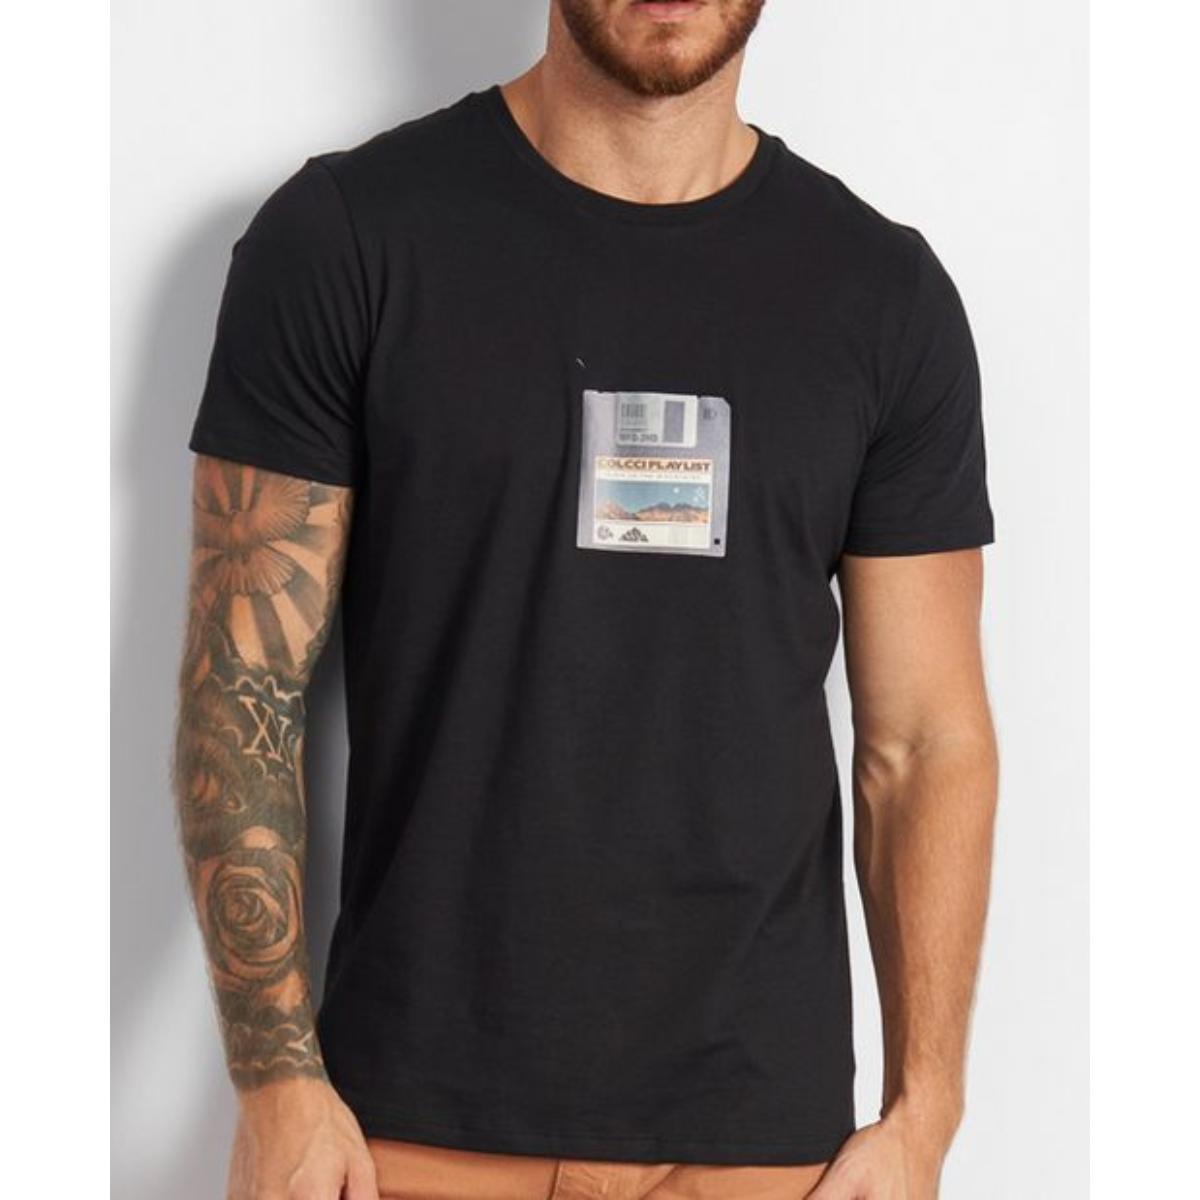 Camiseta Masculina Colcci 350109366 0050 Preto